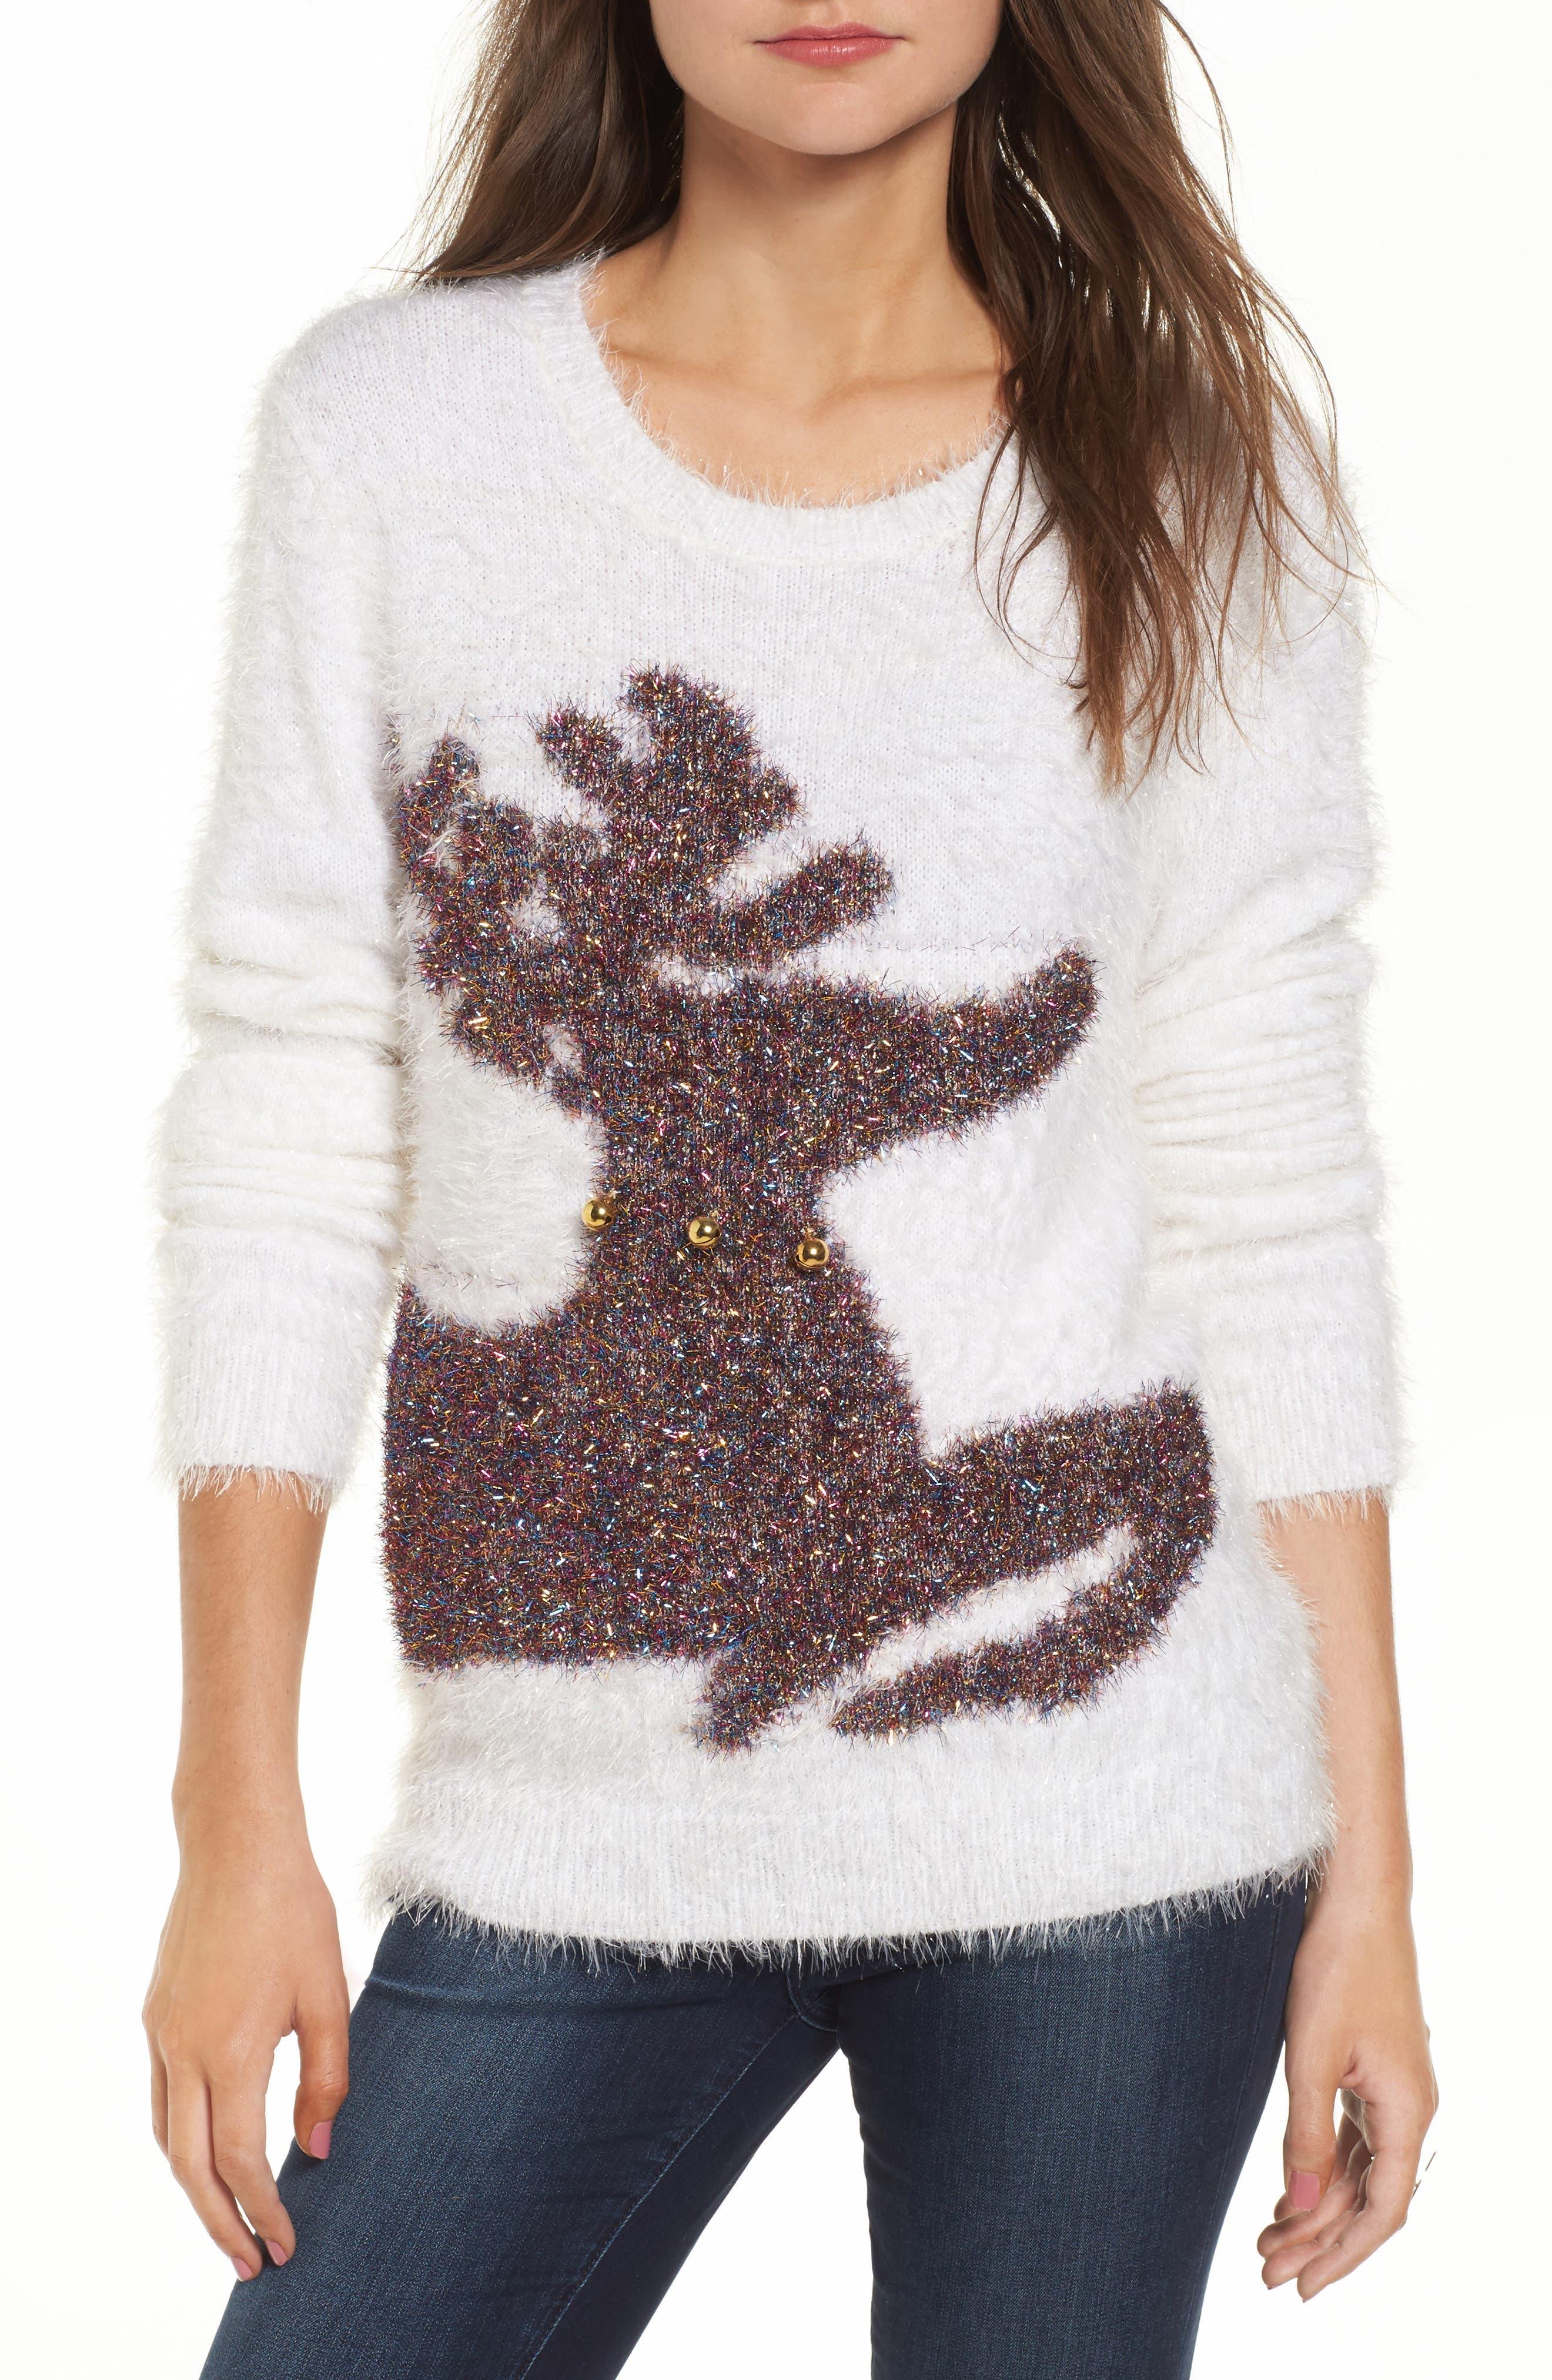 Ten Sixty Sherman Fuzzy Reindeer Sweater